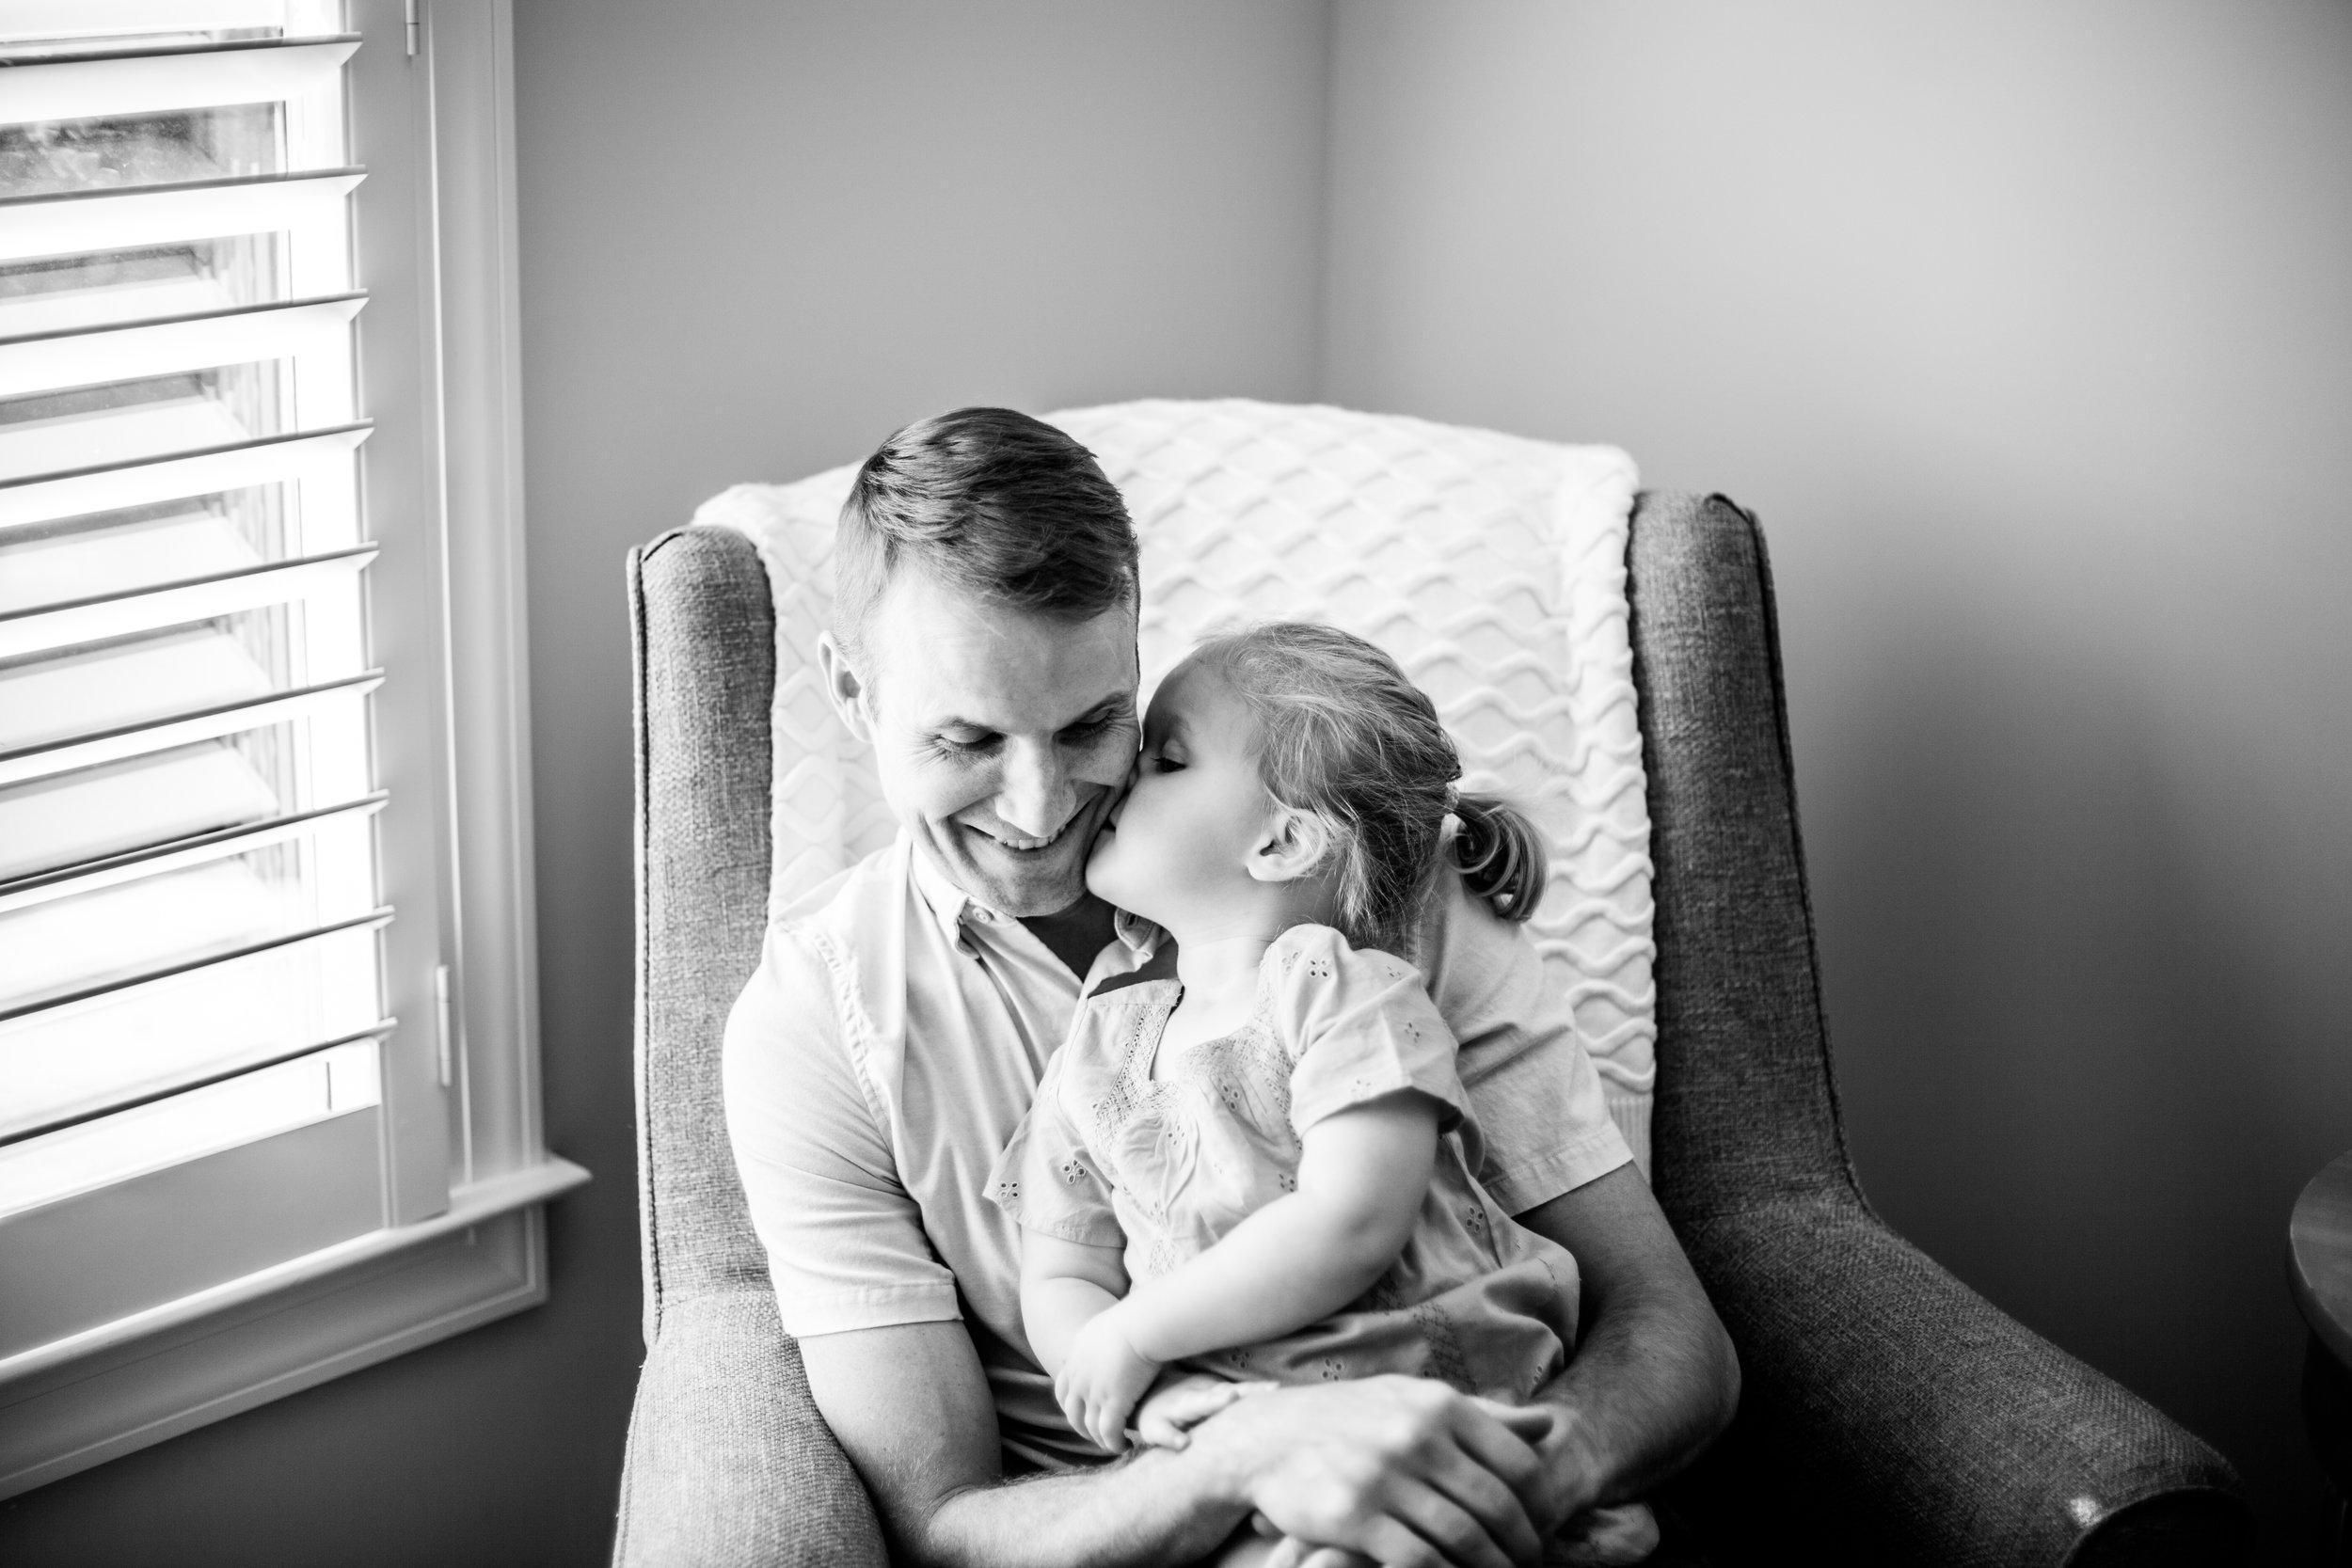 brookhaven-newborn-lifestyle-photography-with-sibling-angela-elliott-wingard-44.jpg